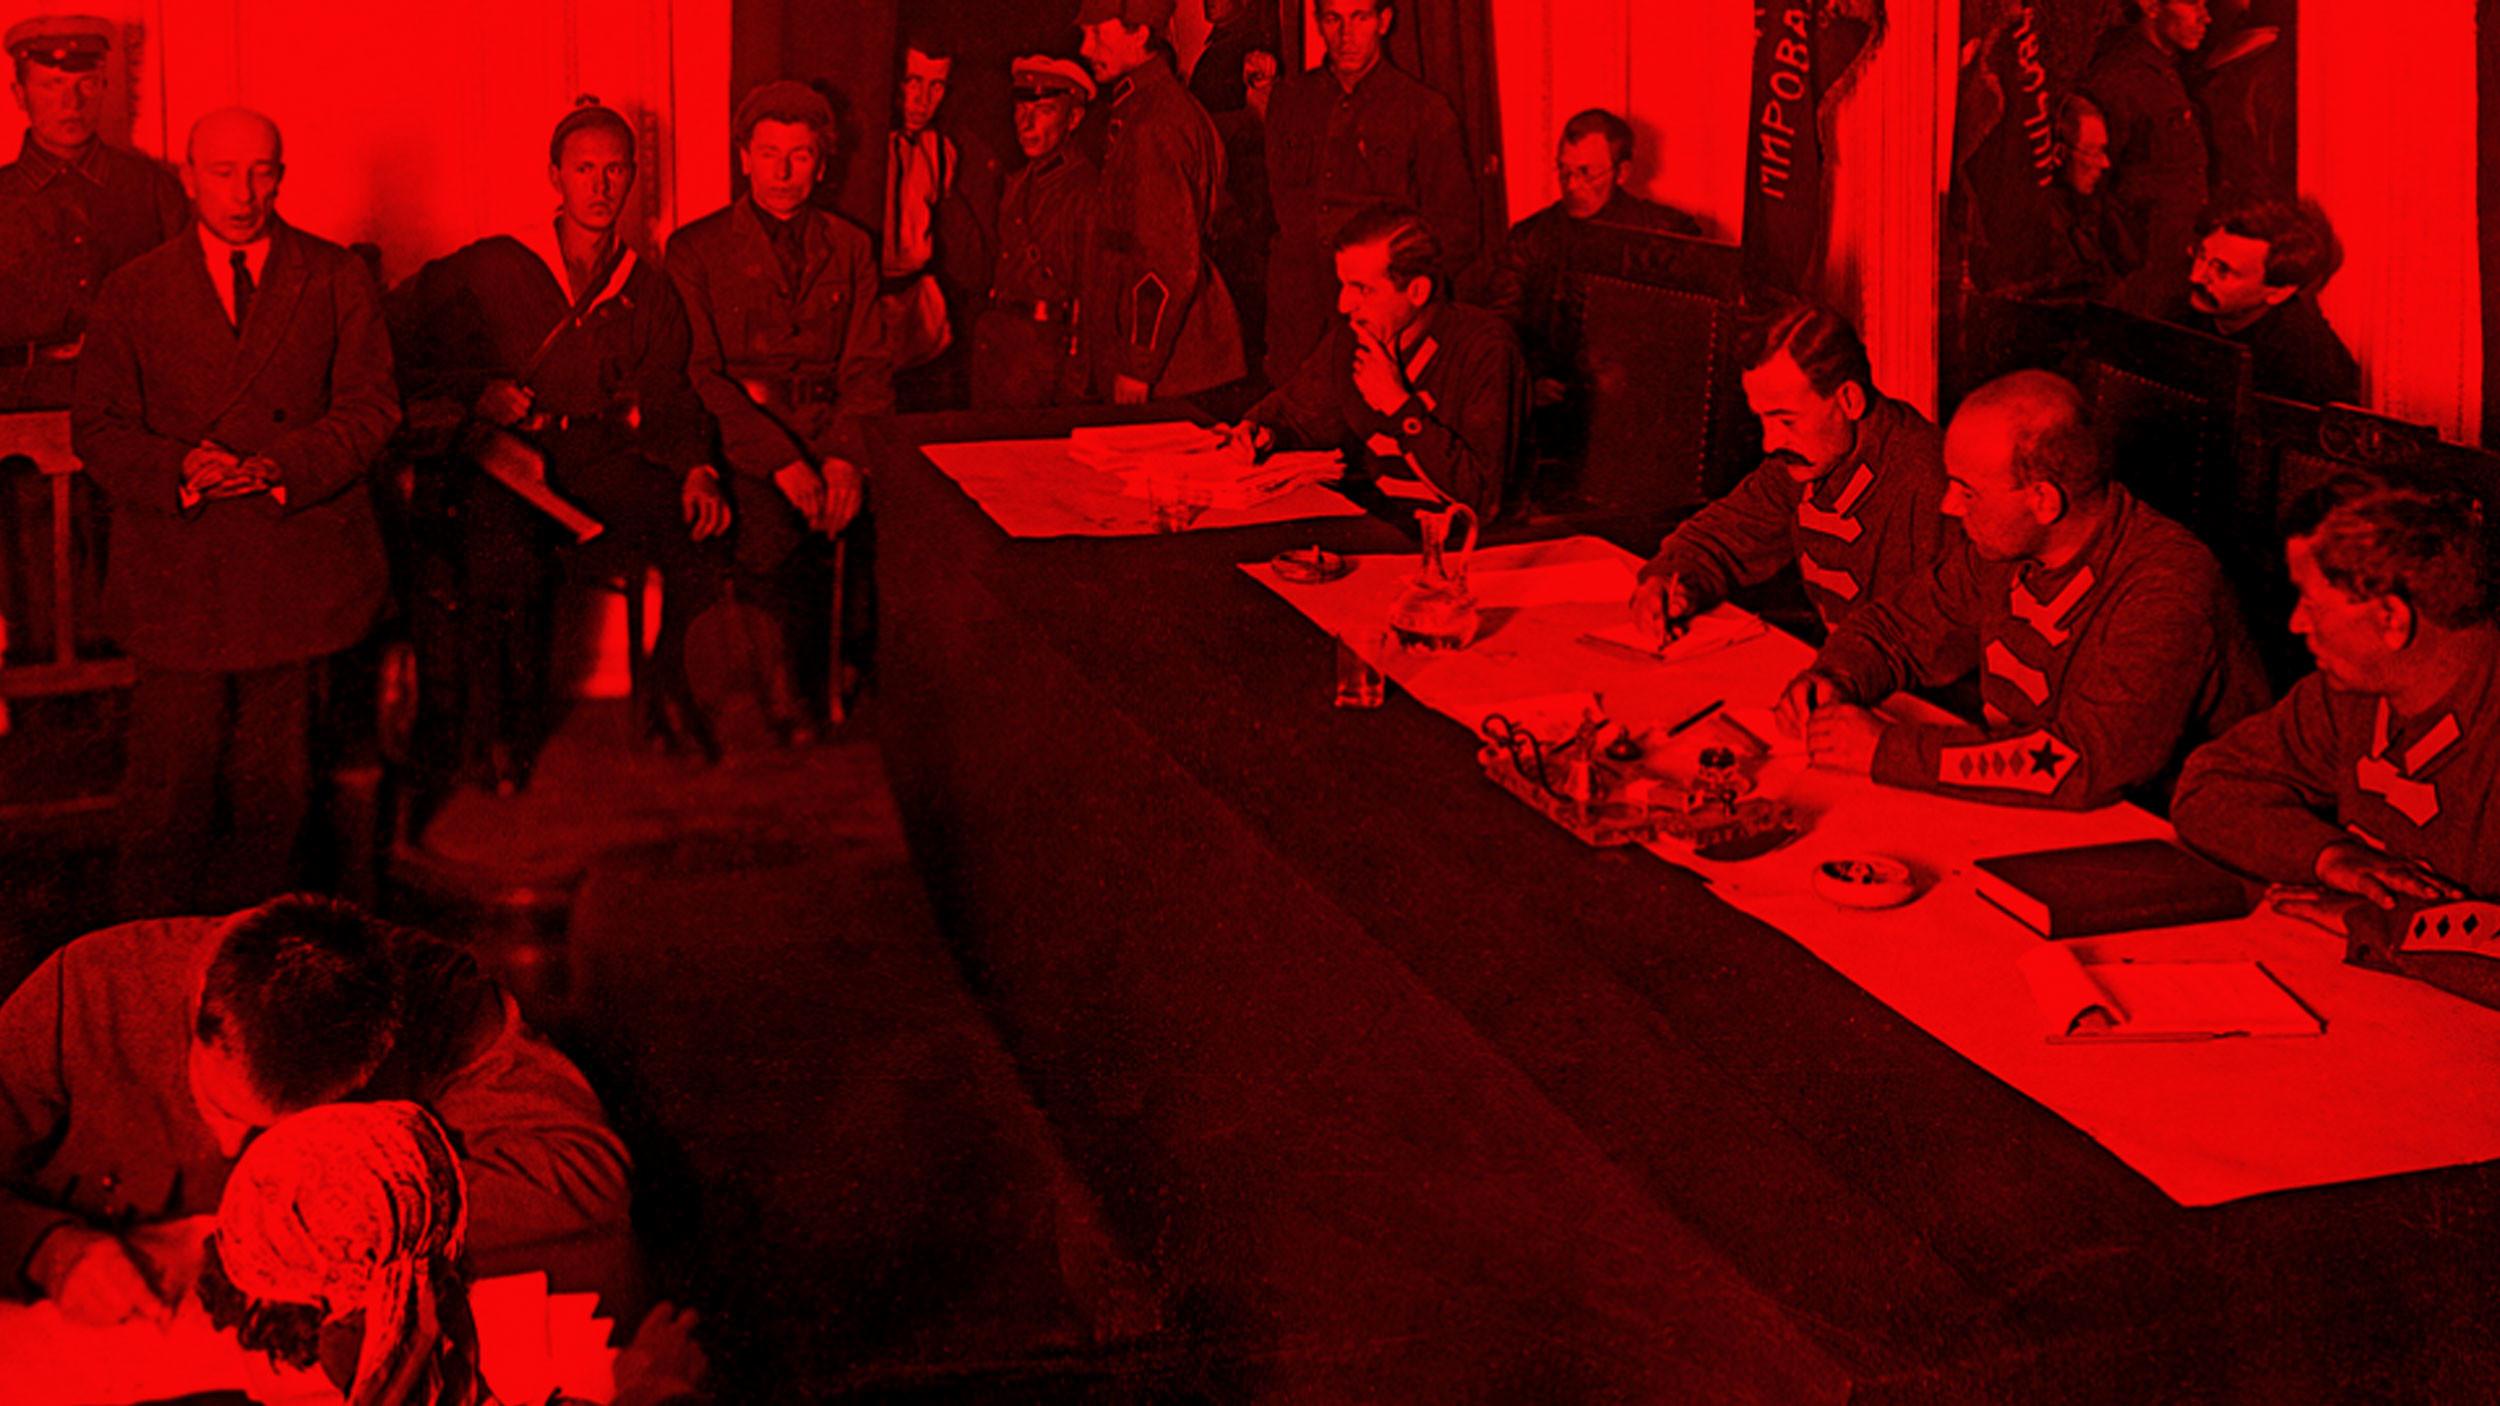 Процесс над Б.В. Савинковым (Савинков стоит слева у стены) 1924 г. Фото © Wikipedia